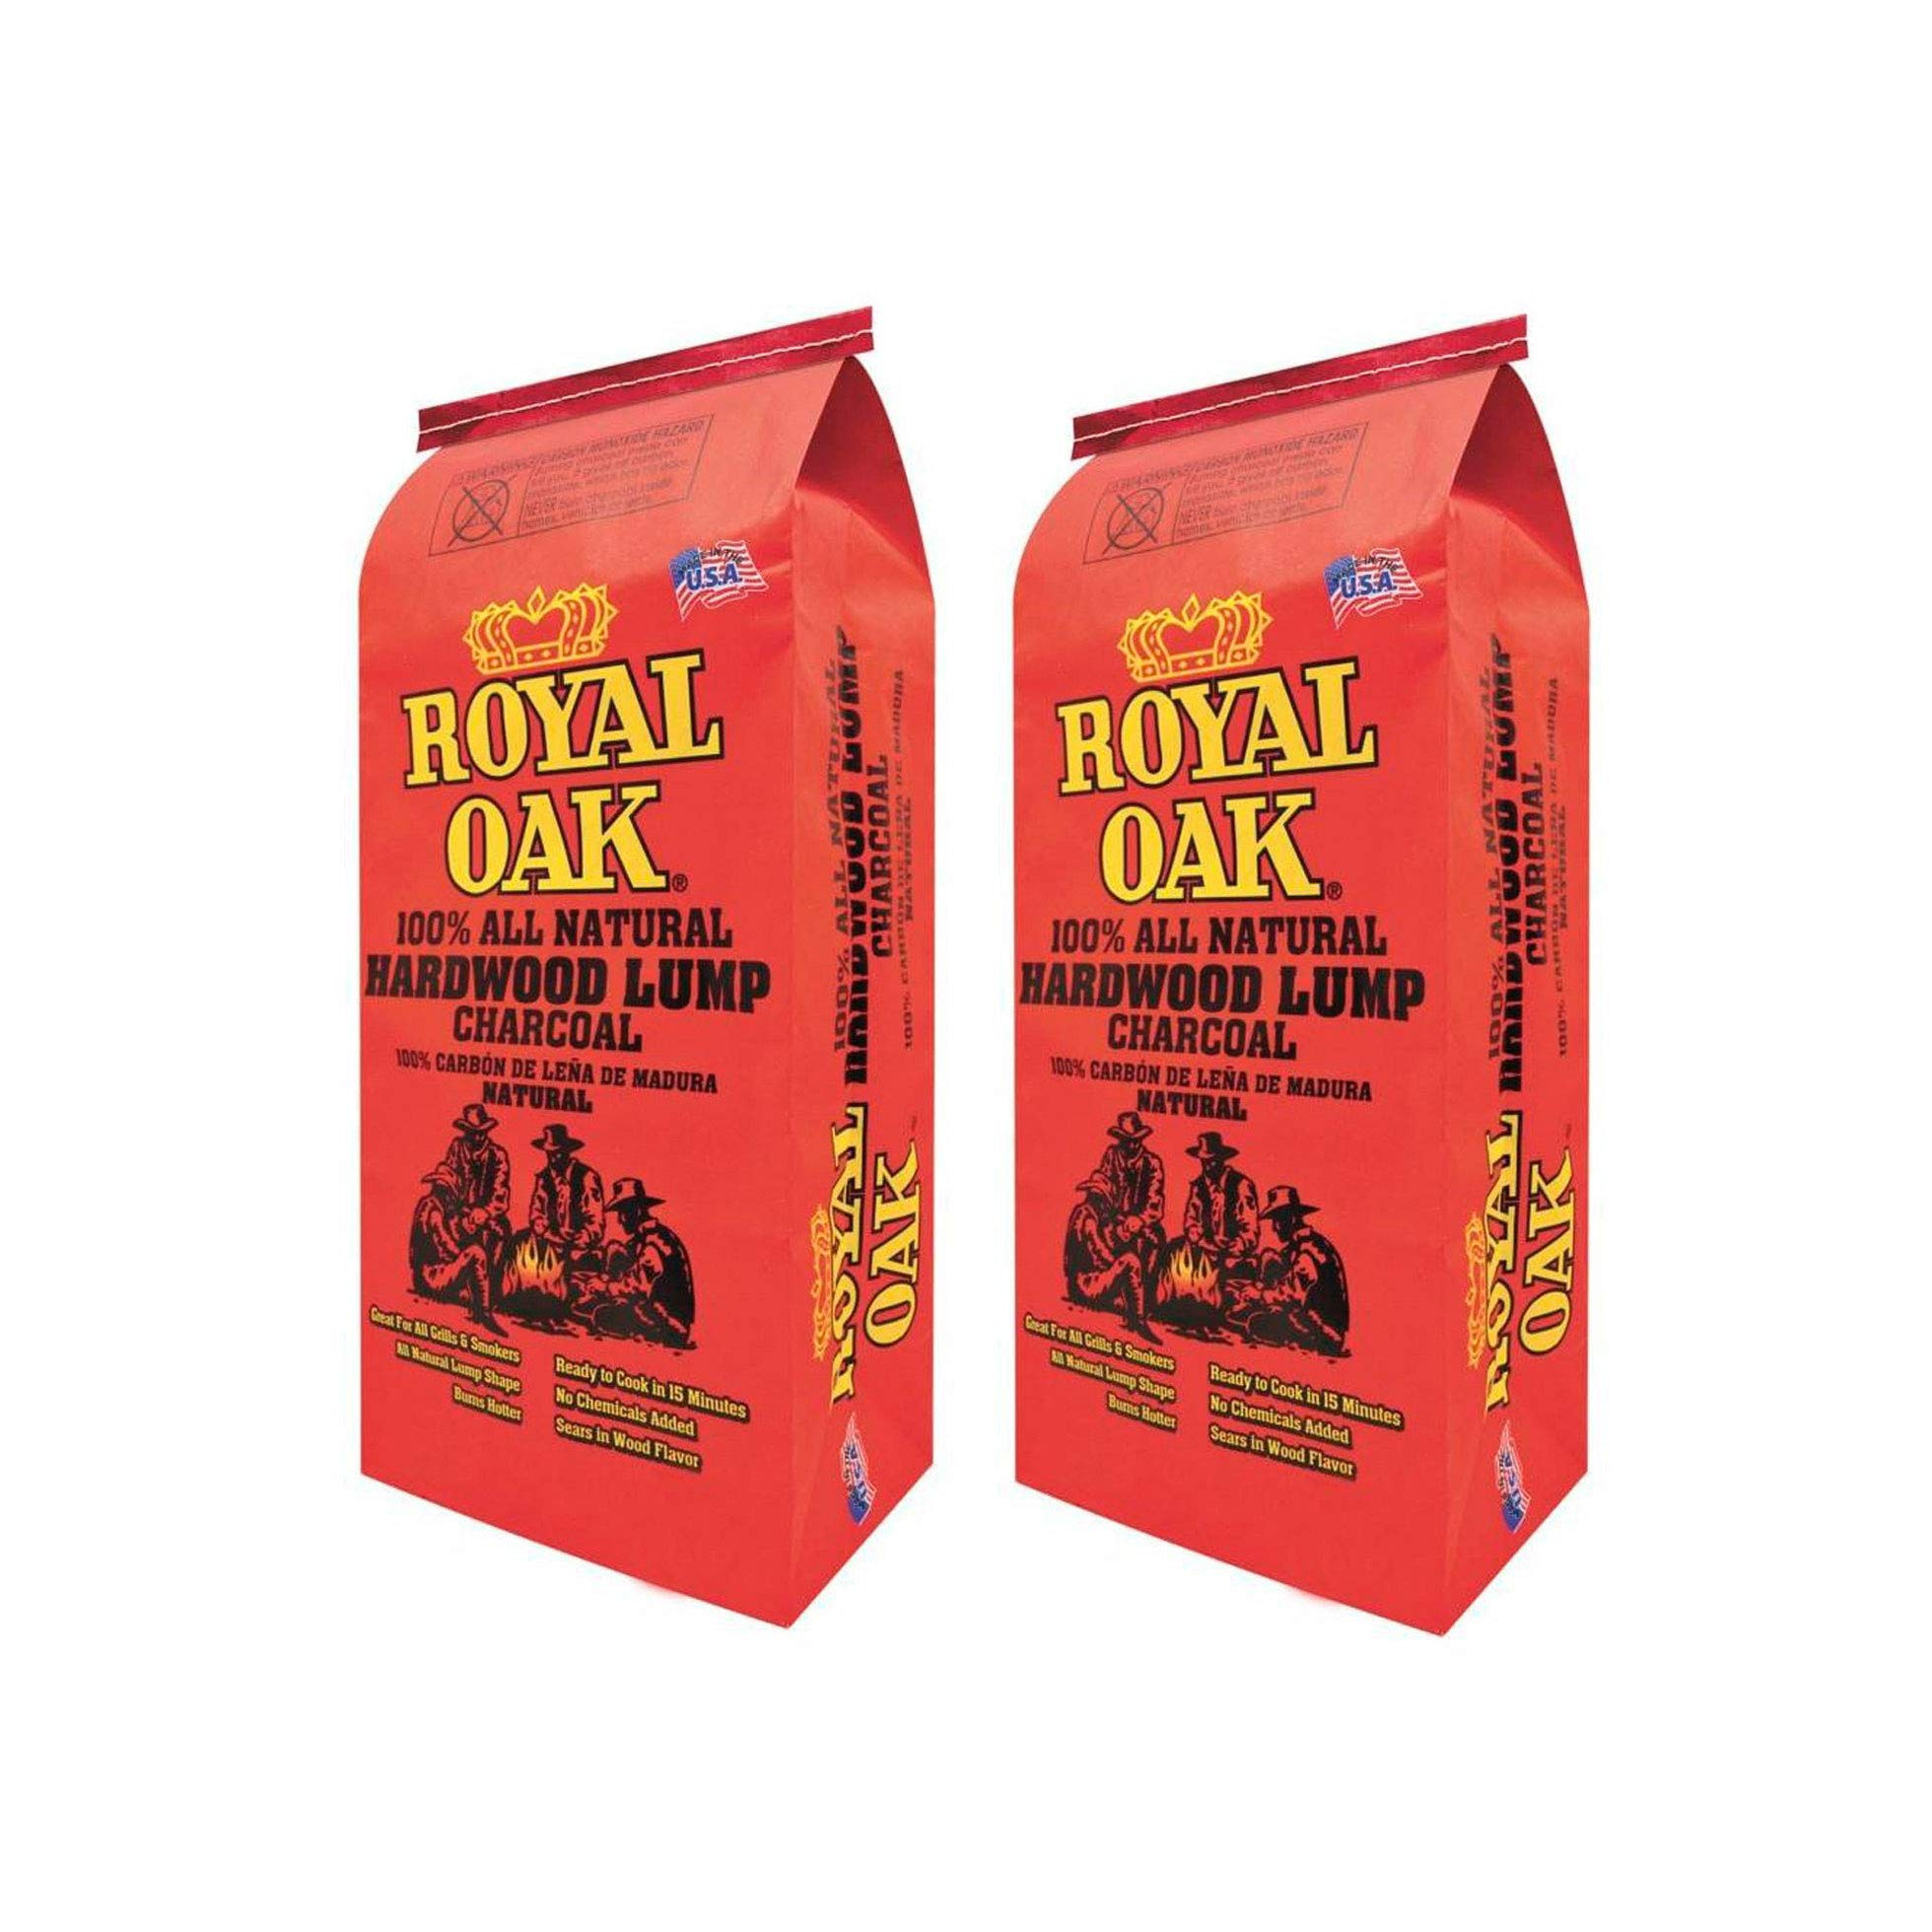 Royal Oak BBQ All Natural Premium 8 Pound Bag Lump Charcoal Starter Hardwood (2 Pack)